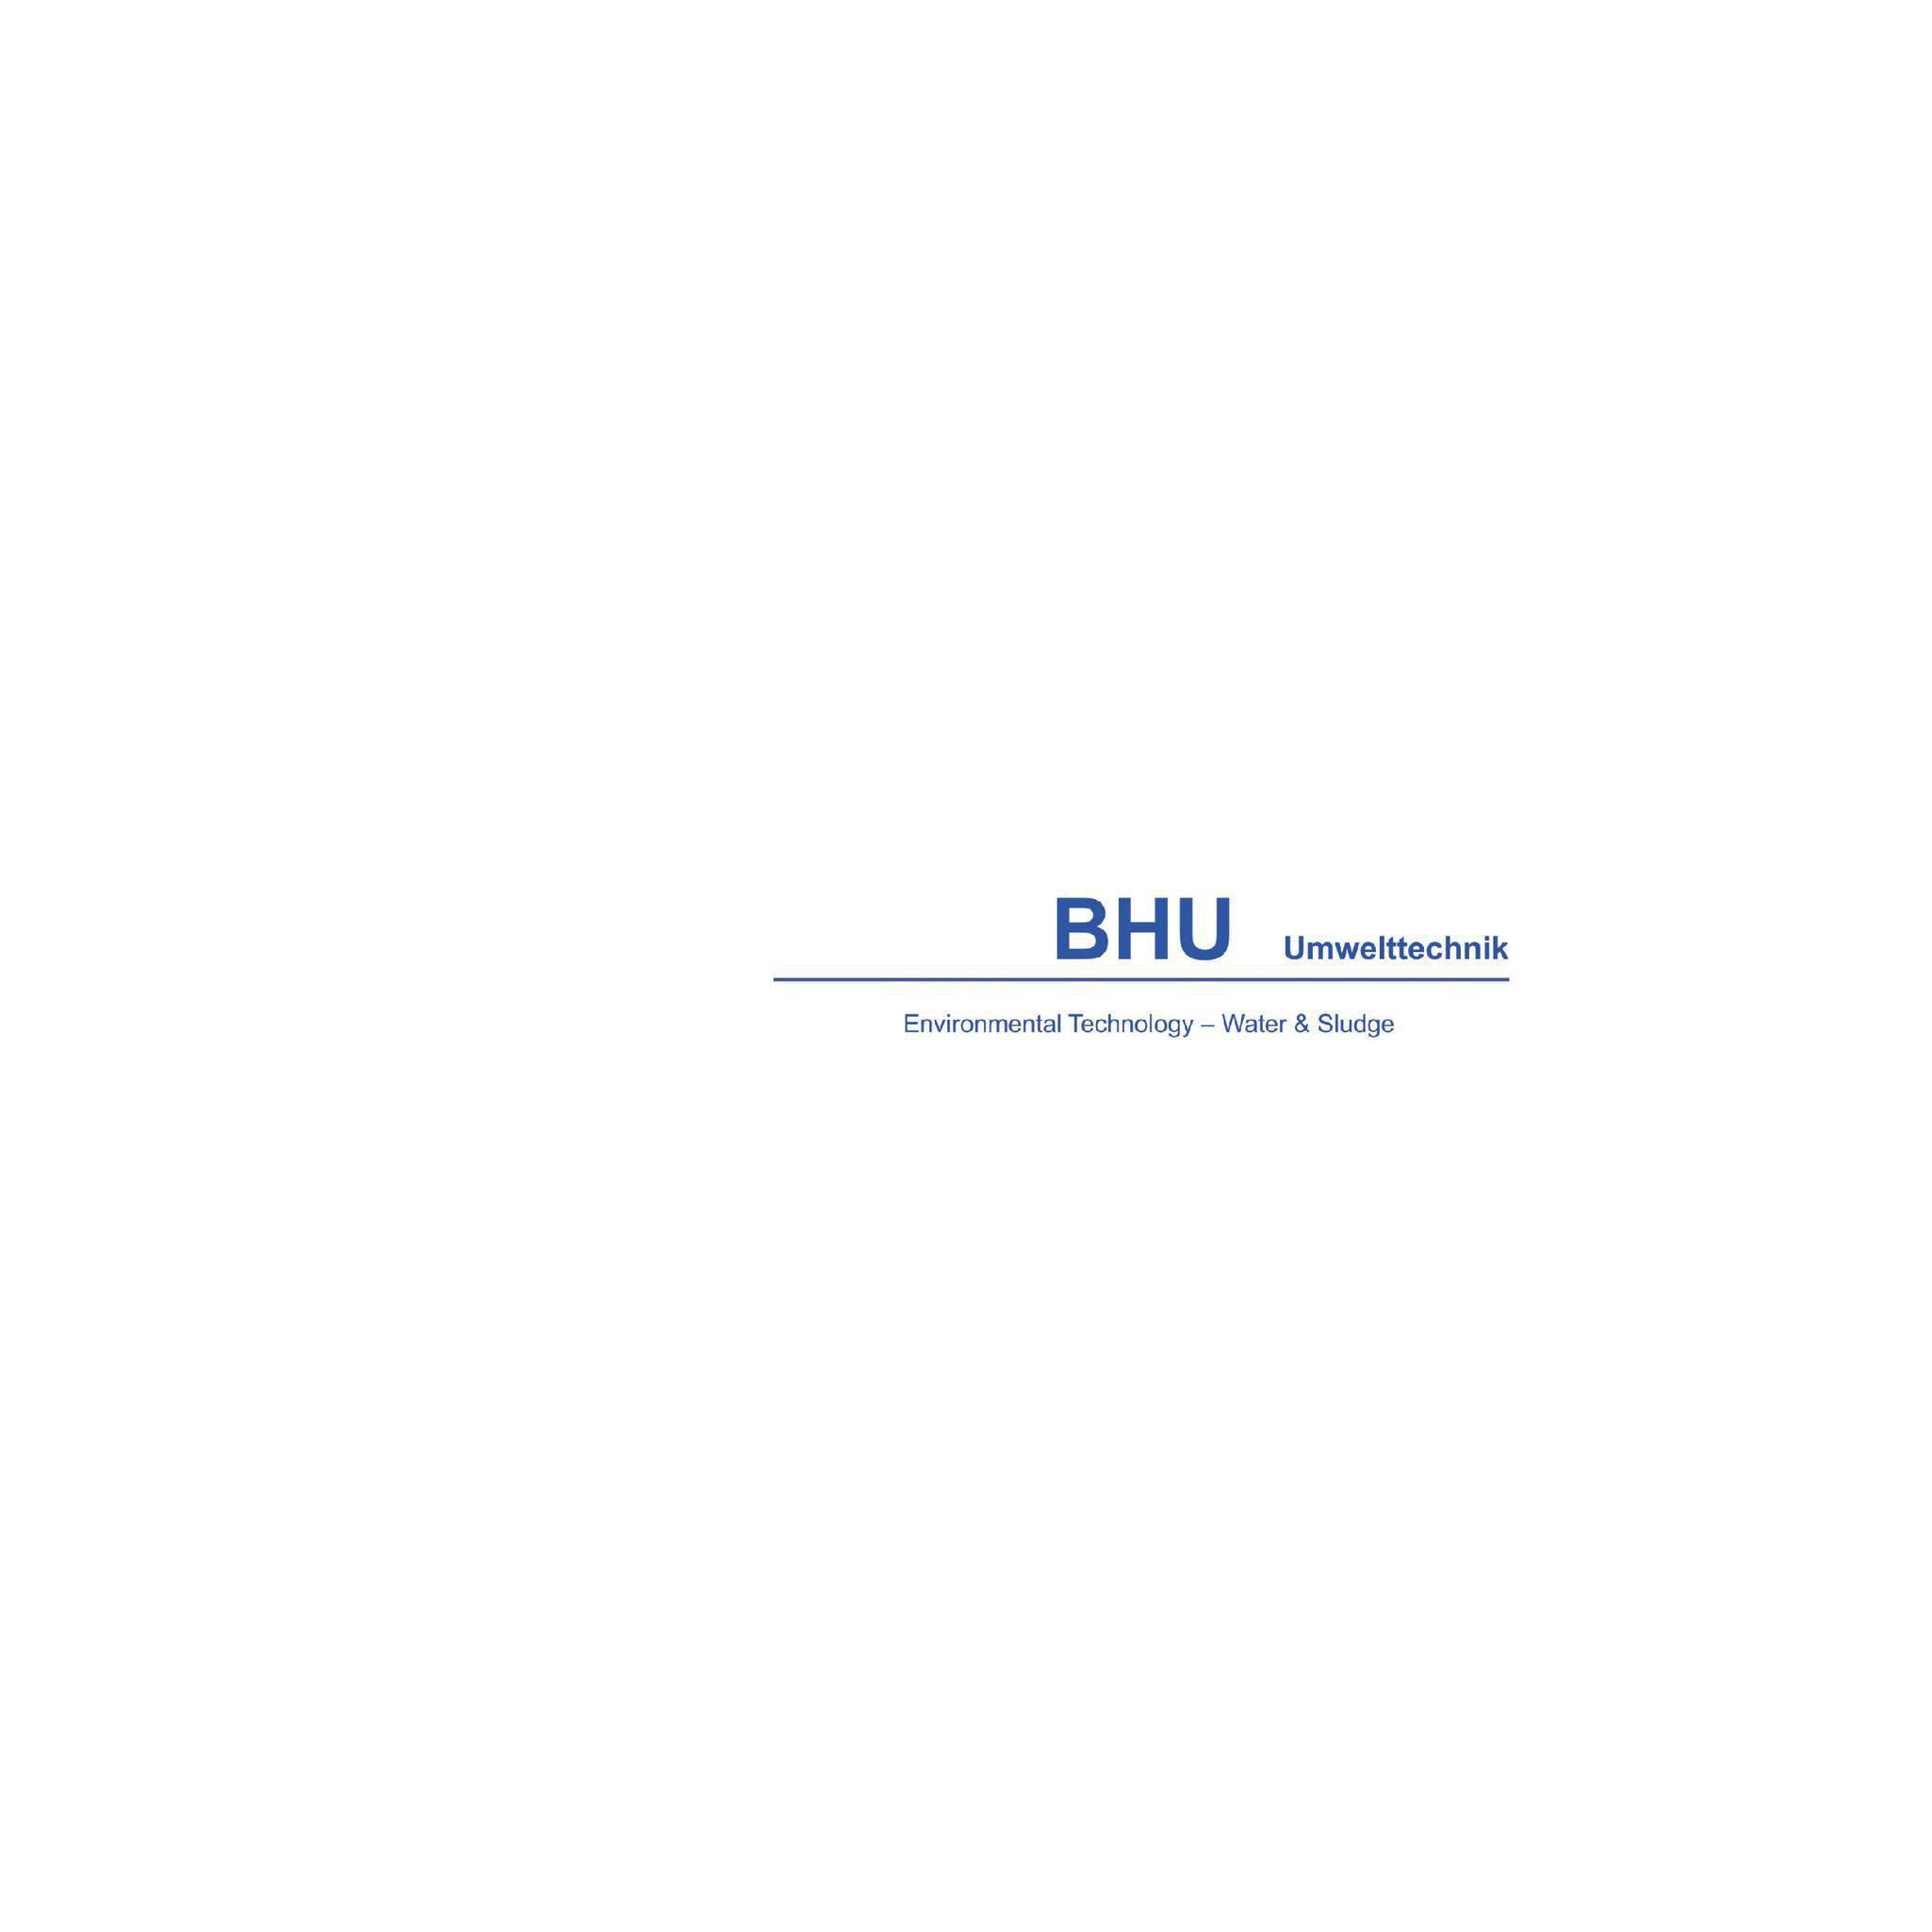 Company logo of BHU Umwelttechnik GmbH